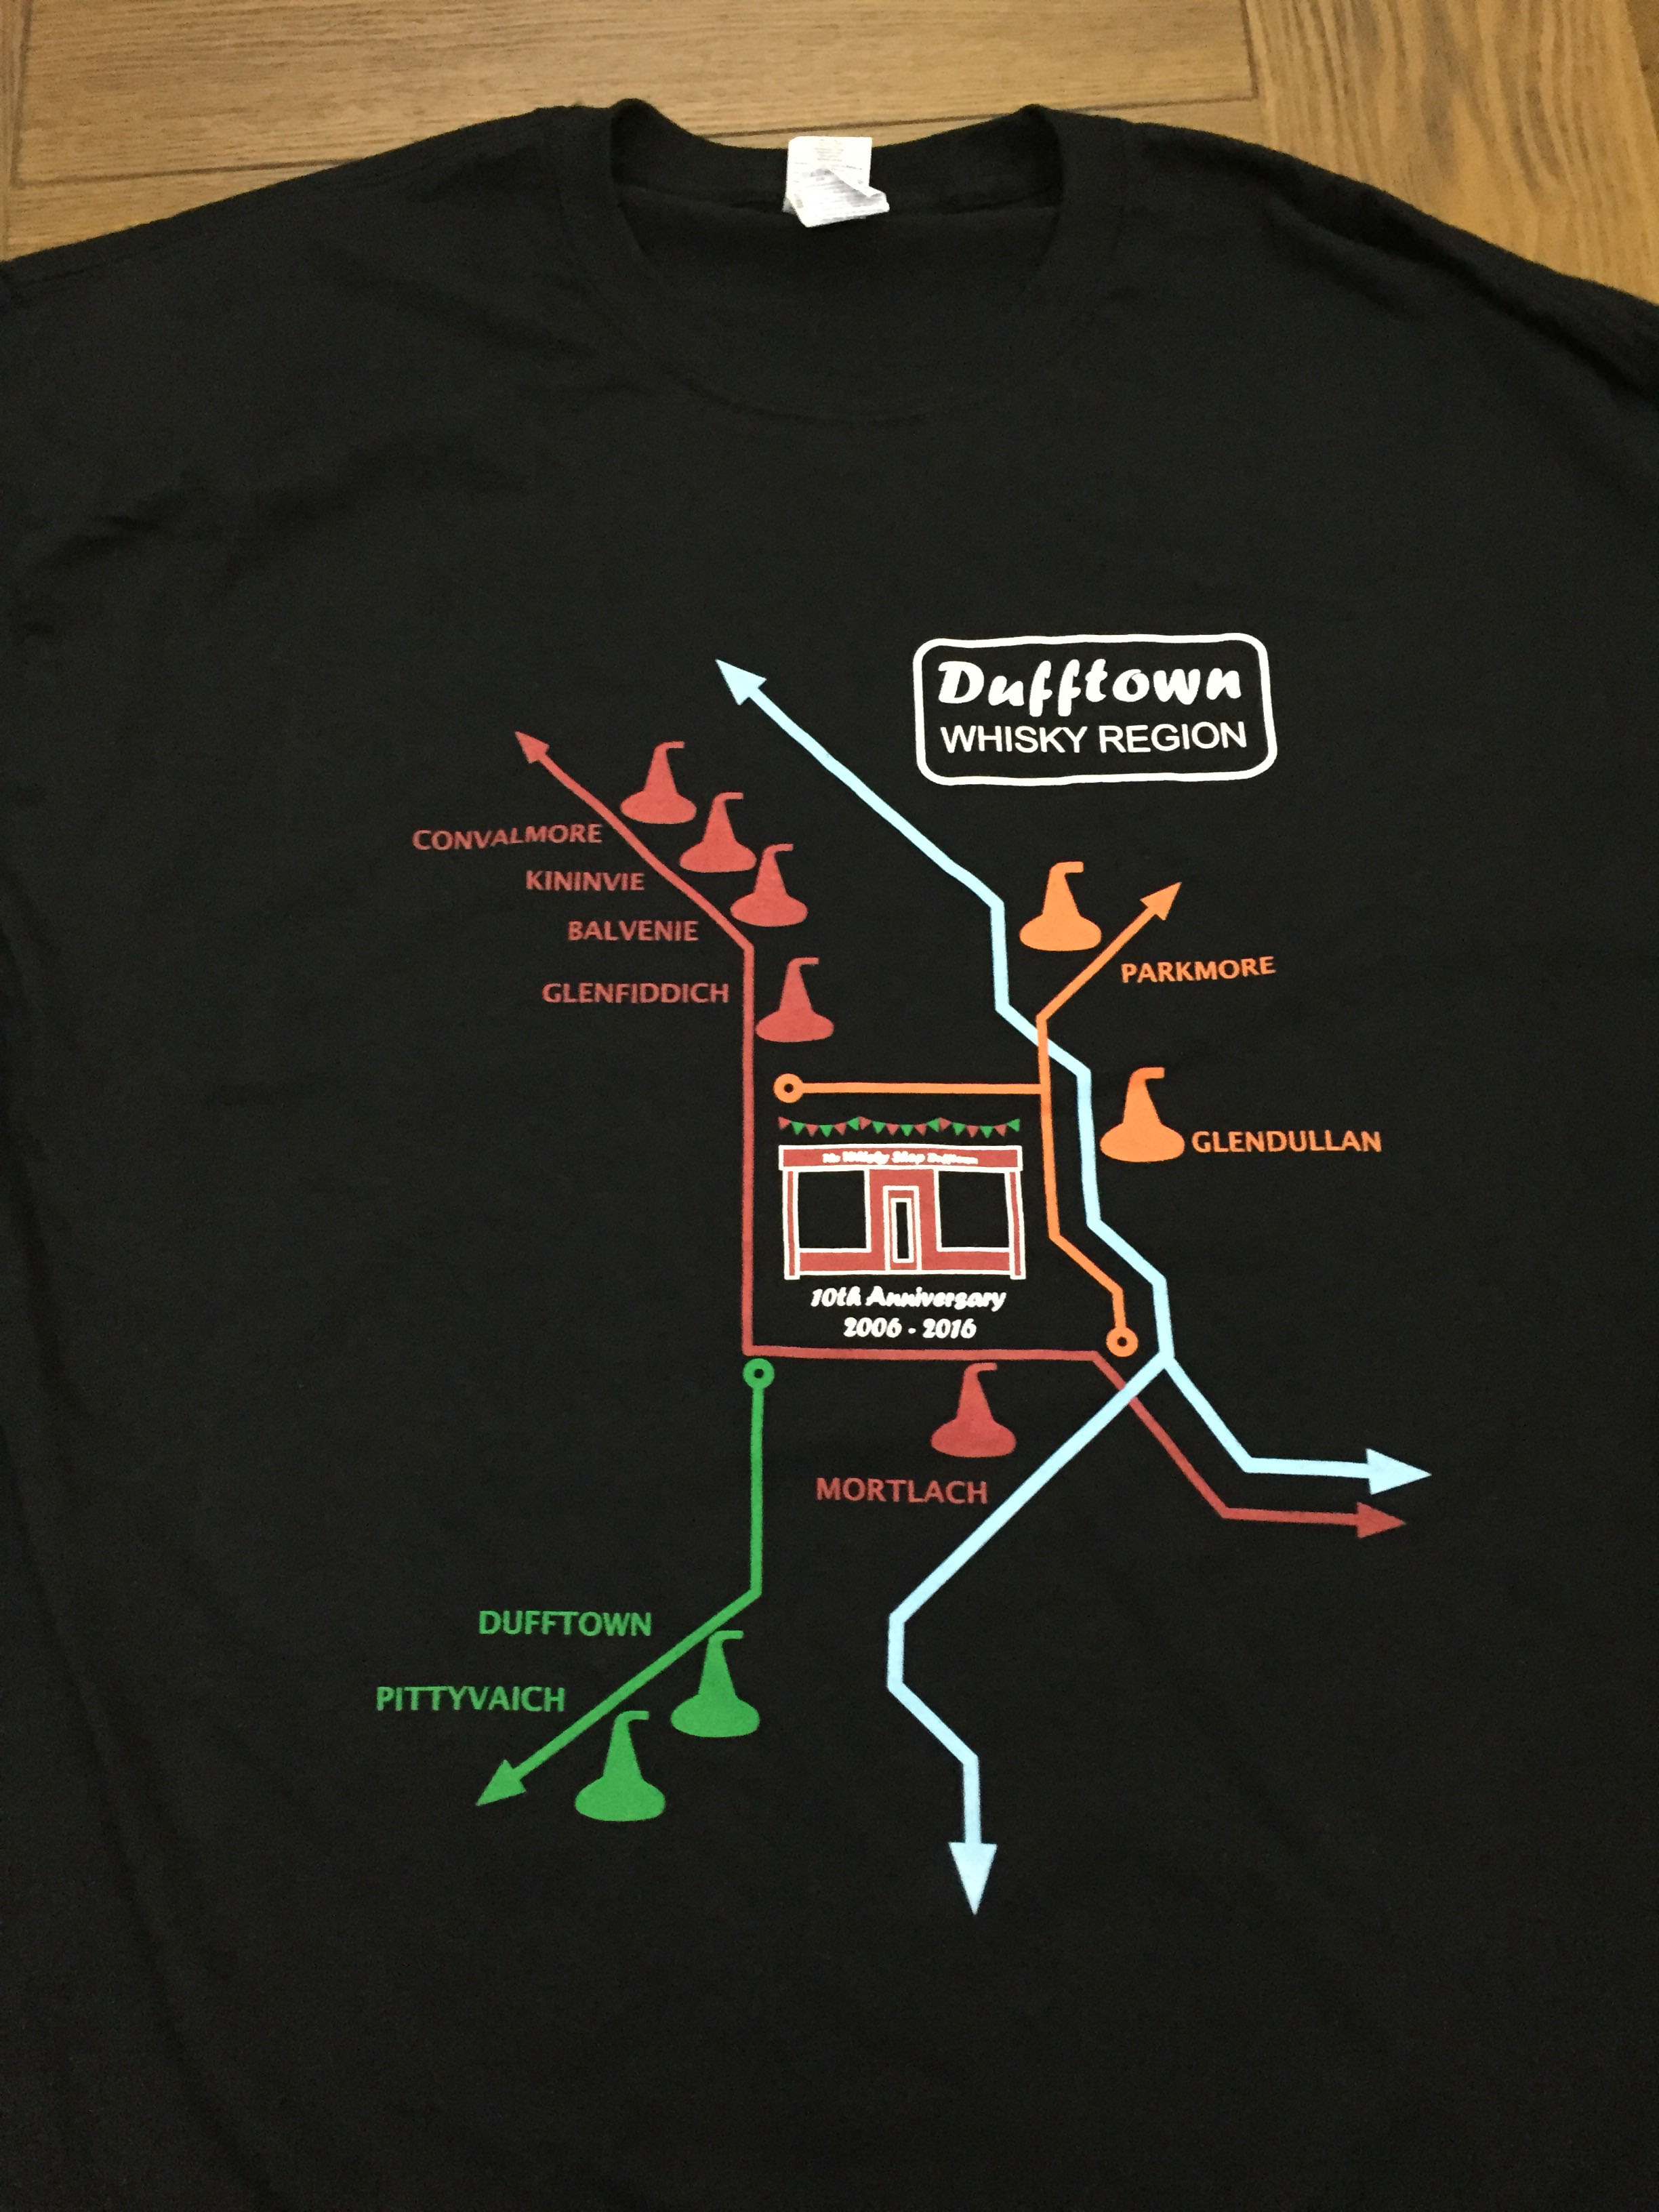 WSD Dufftown Region T-Shirt v1